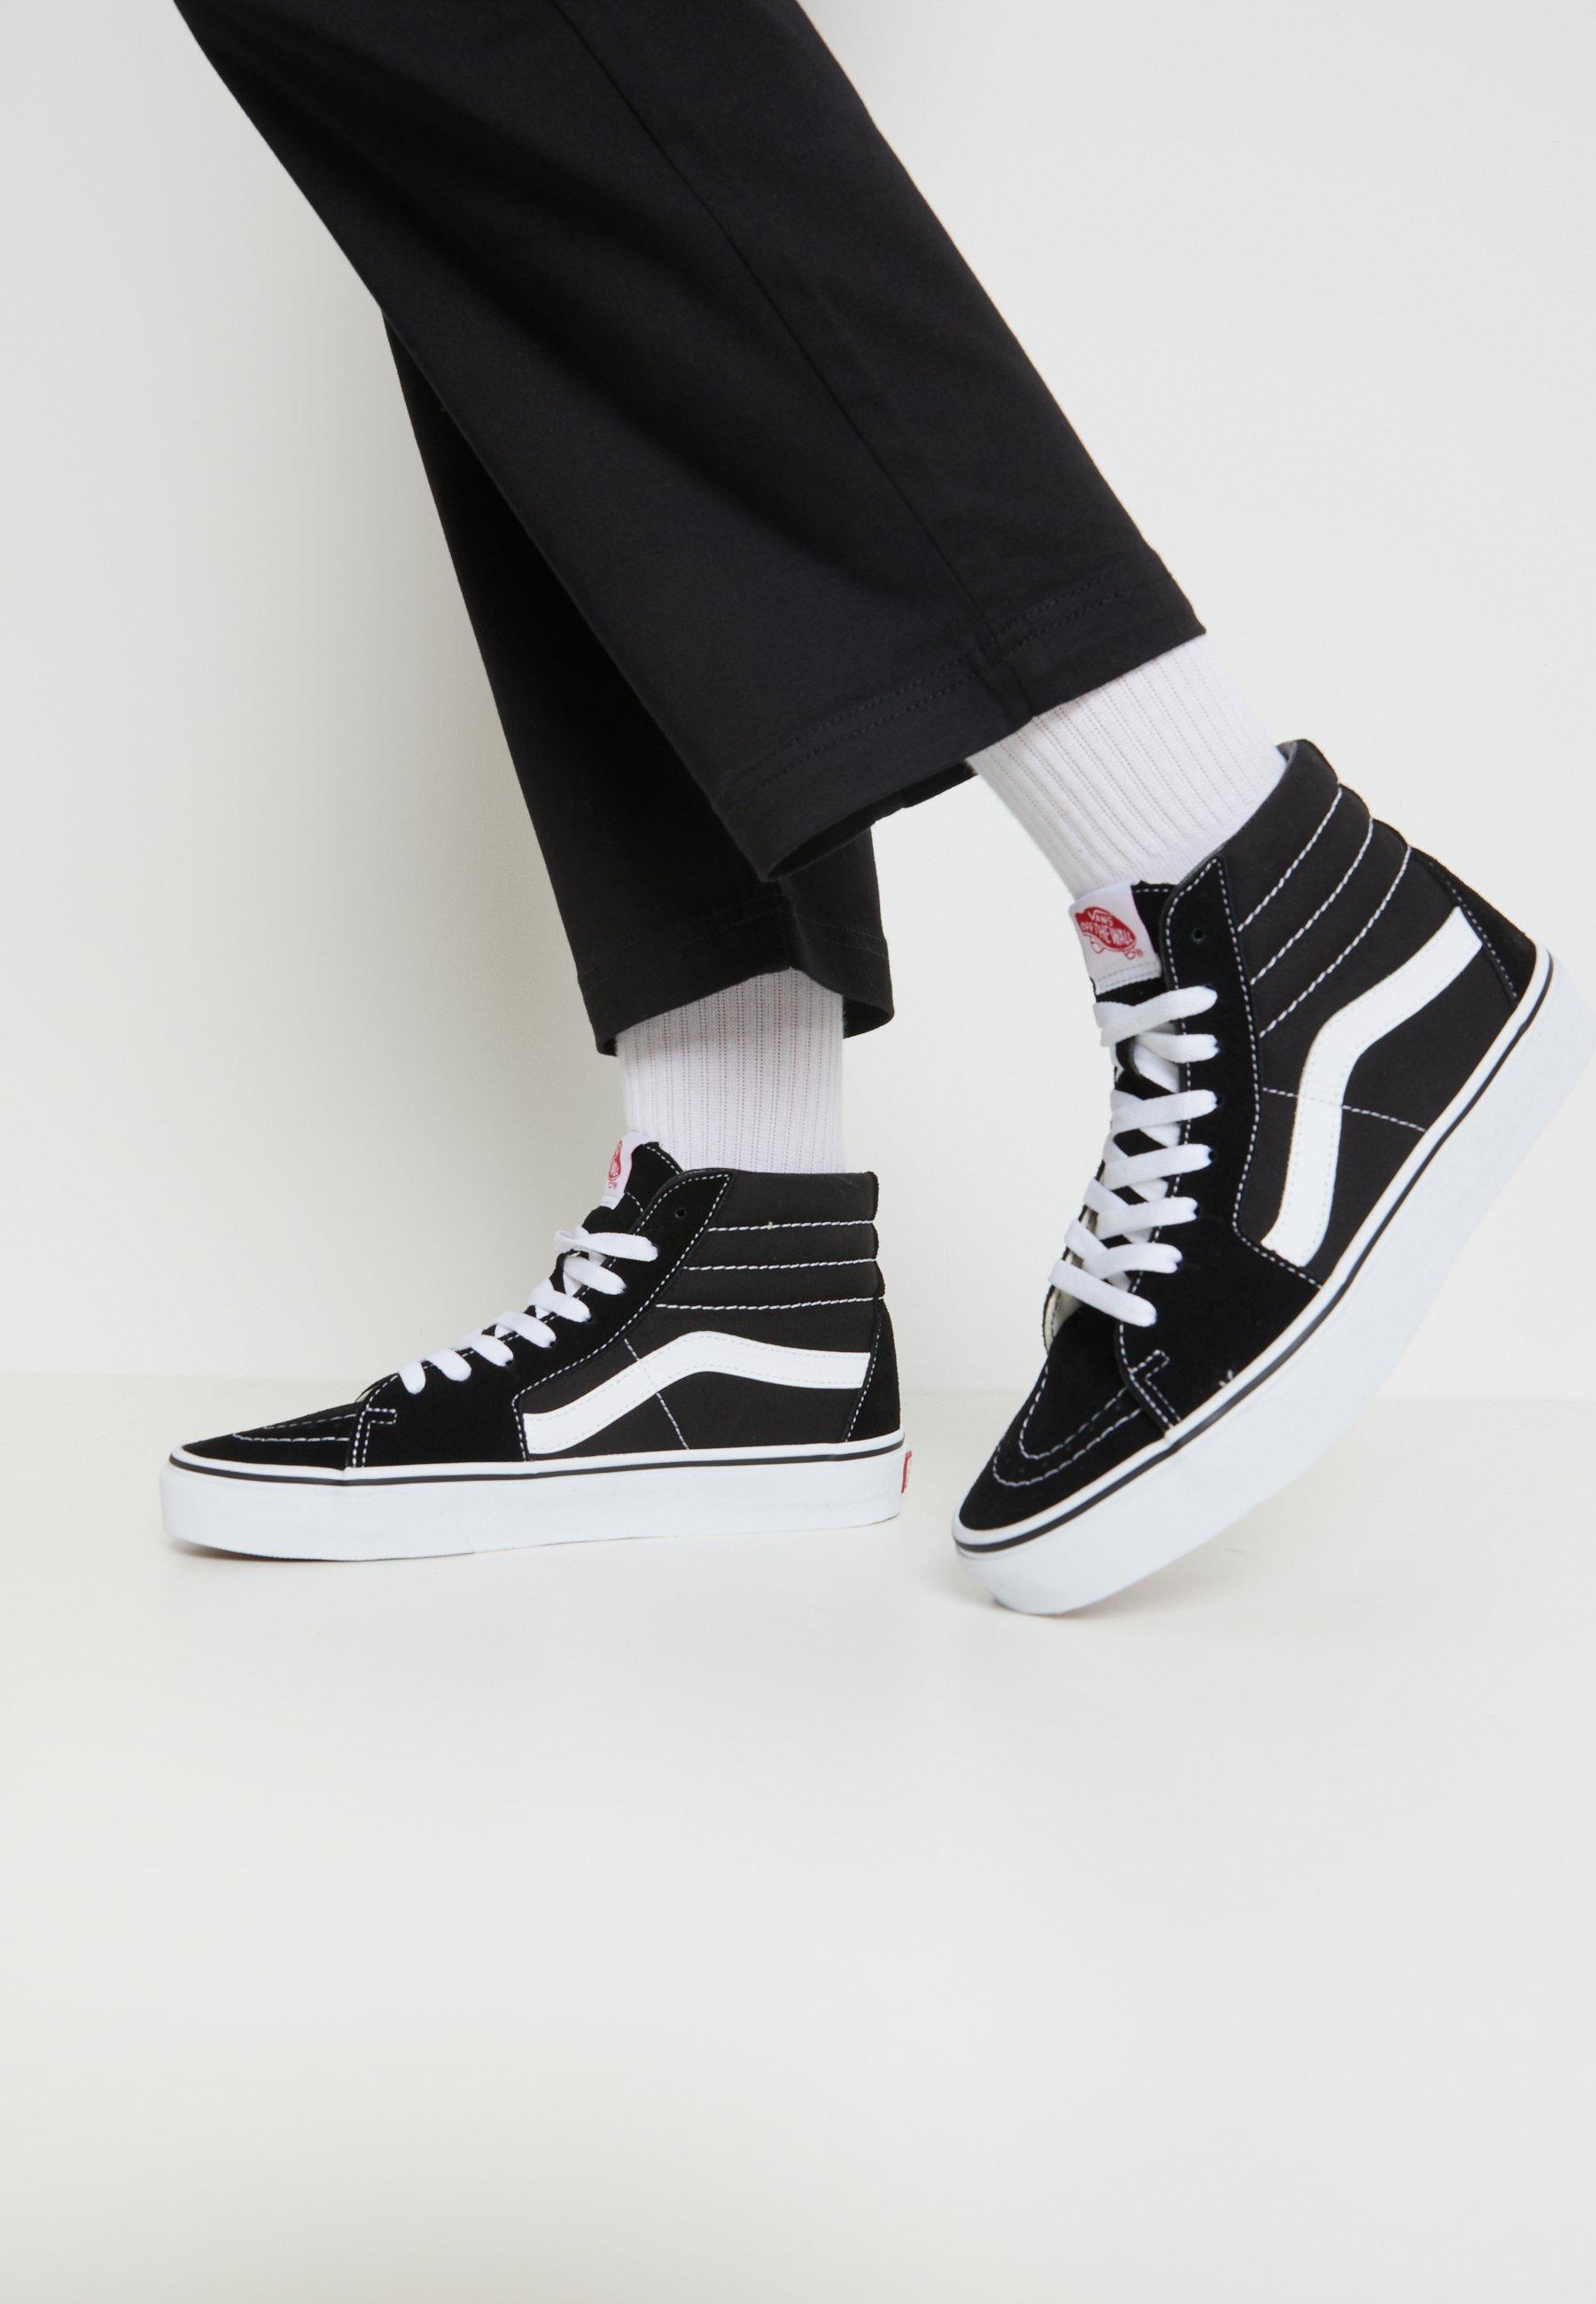 svarta höga sneakers